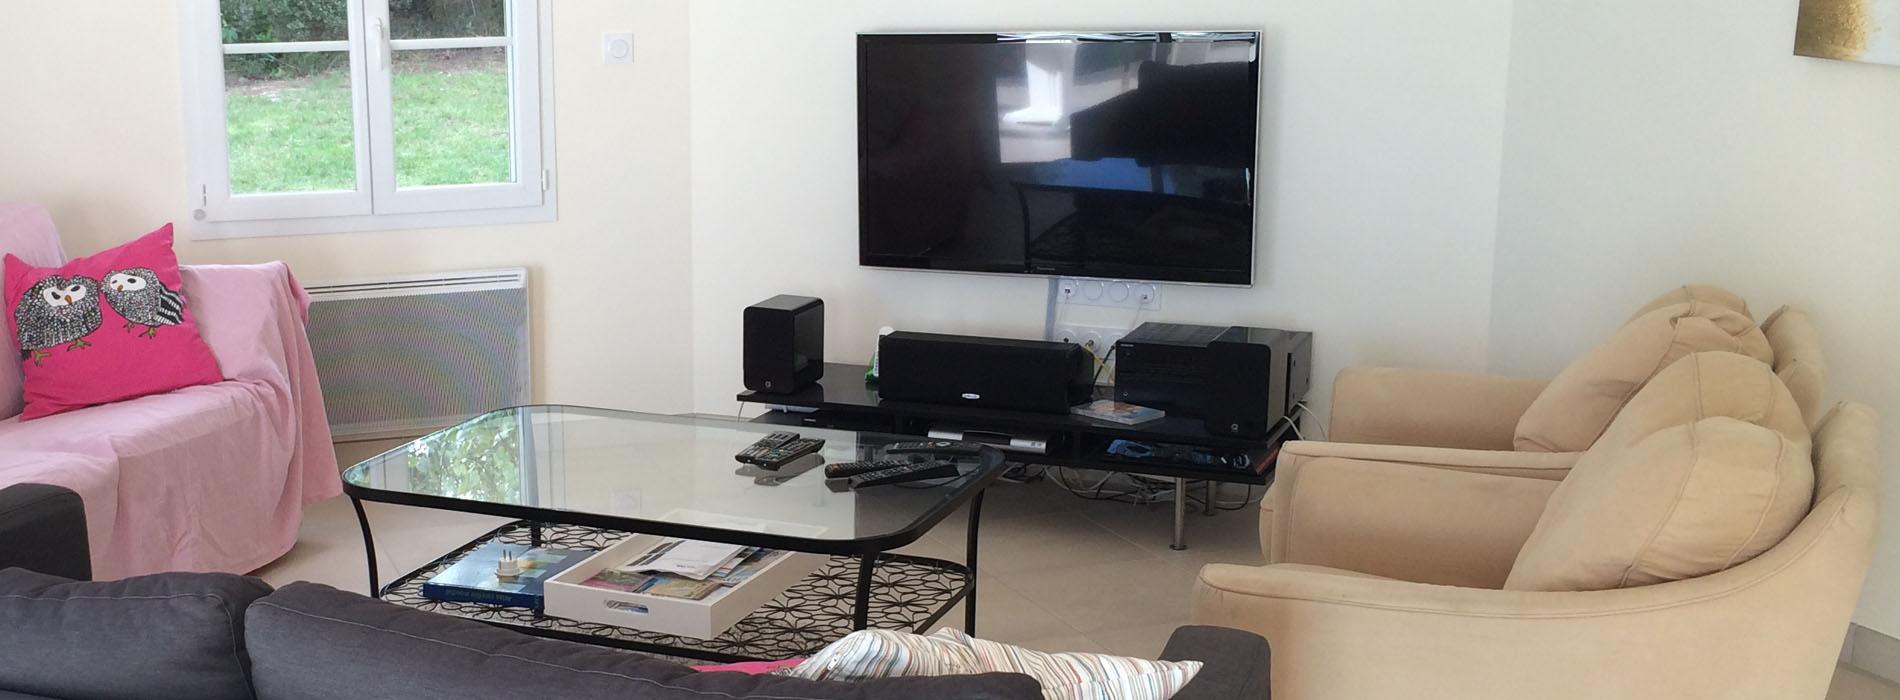 Ol Ron Villa Holiday Home Rental On Ile D Ol Ron Facilities  # Table Tv Avec Home Cinema